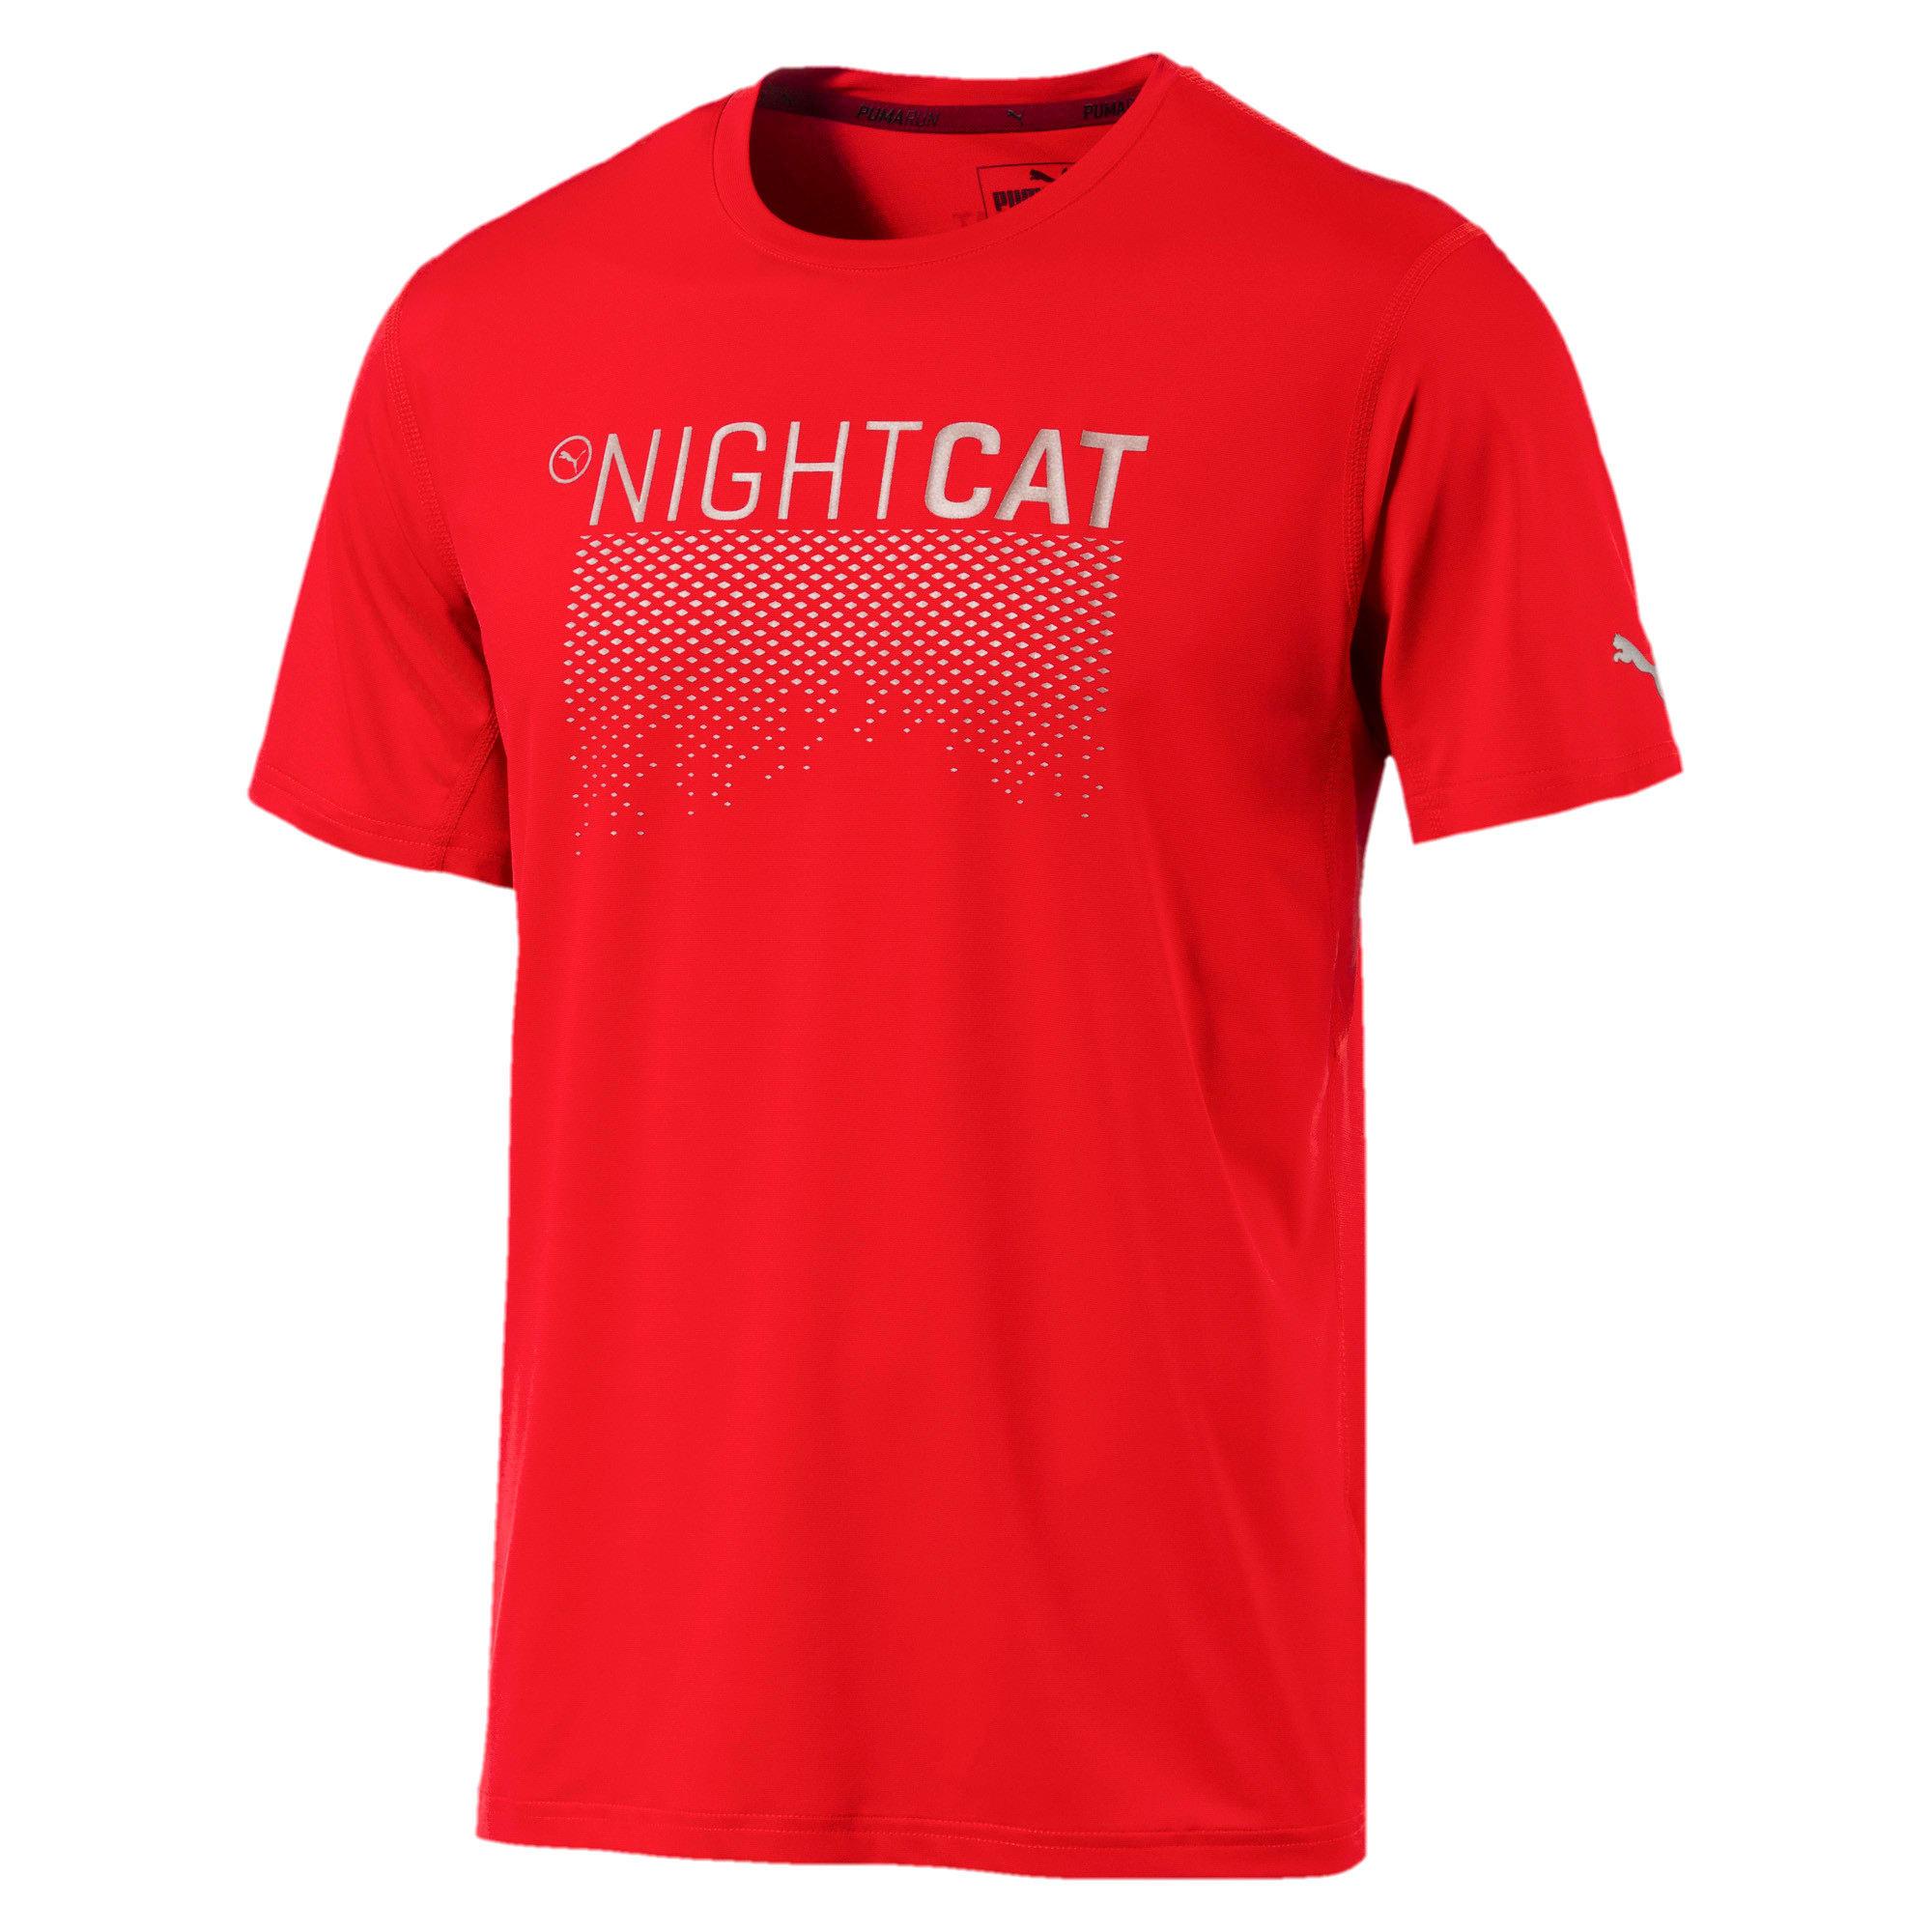 Thumbnail 1 of NightCat Men's Short Sleeve T-Shirt, Flame Scarlet, medium-IND